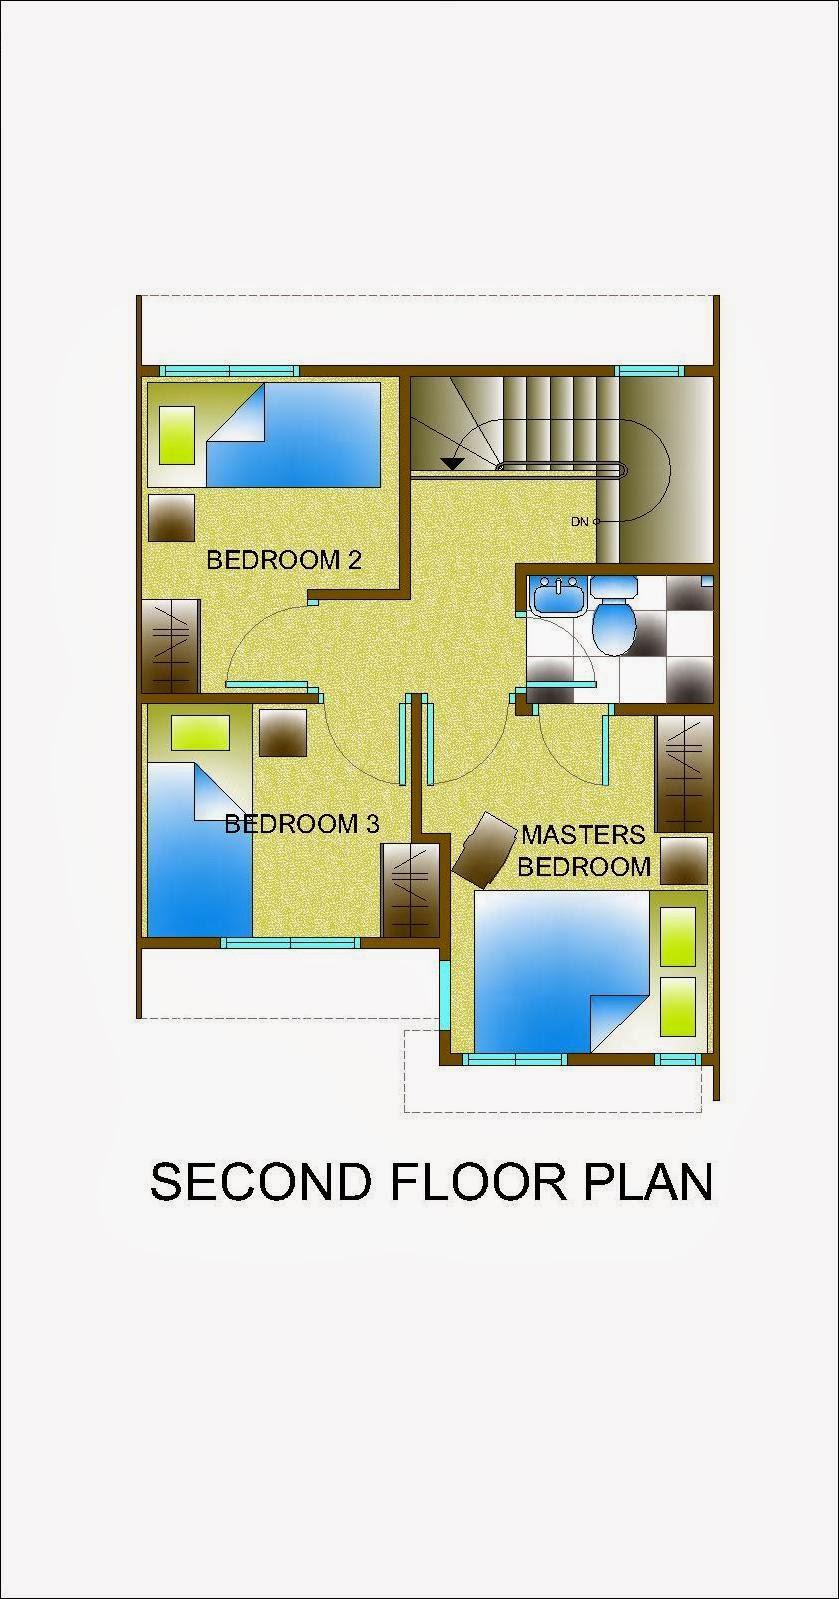 wonderful 2 bedroom double wide floor plans 2 3 bedroom wonderful 2 bedroom double wide floor plans 2 3 bedroom townhouse